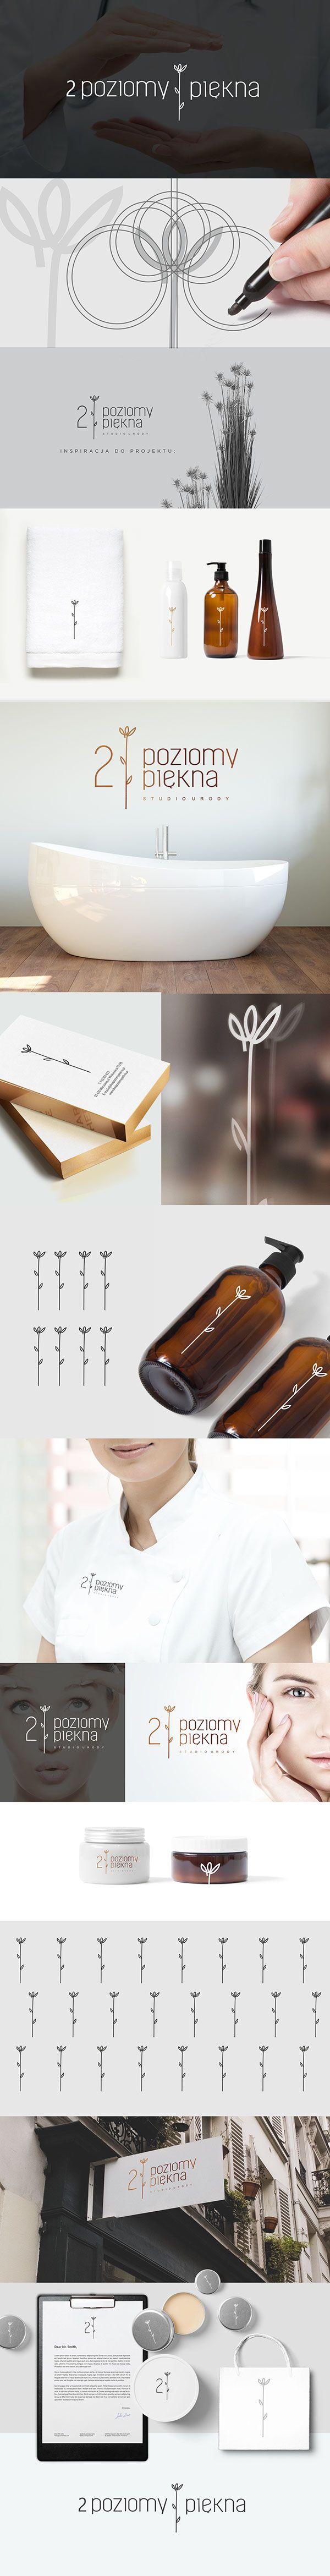 2 POZIOMY PIĘKNA - cosmetic salon on Behance